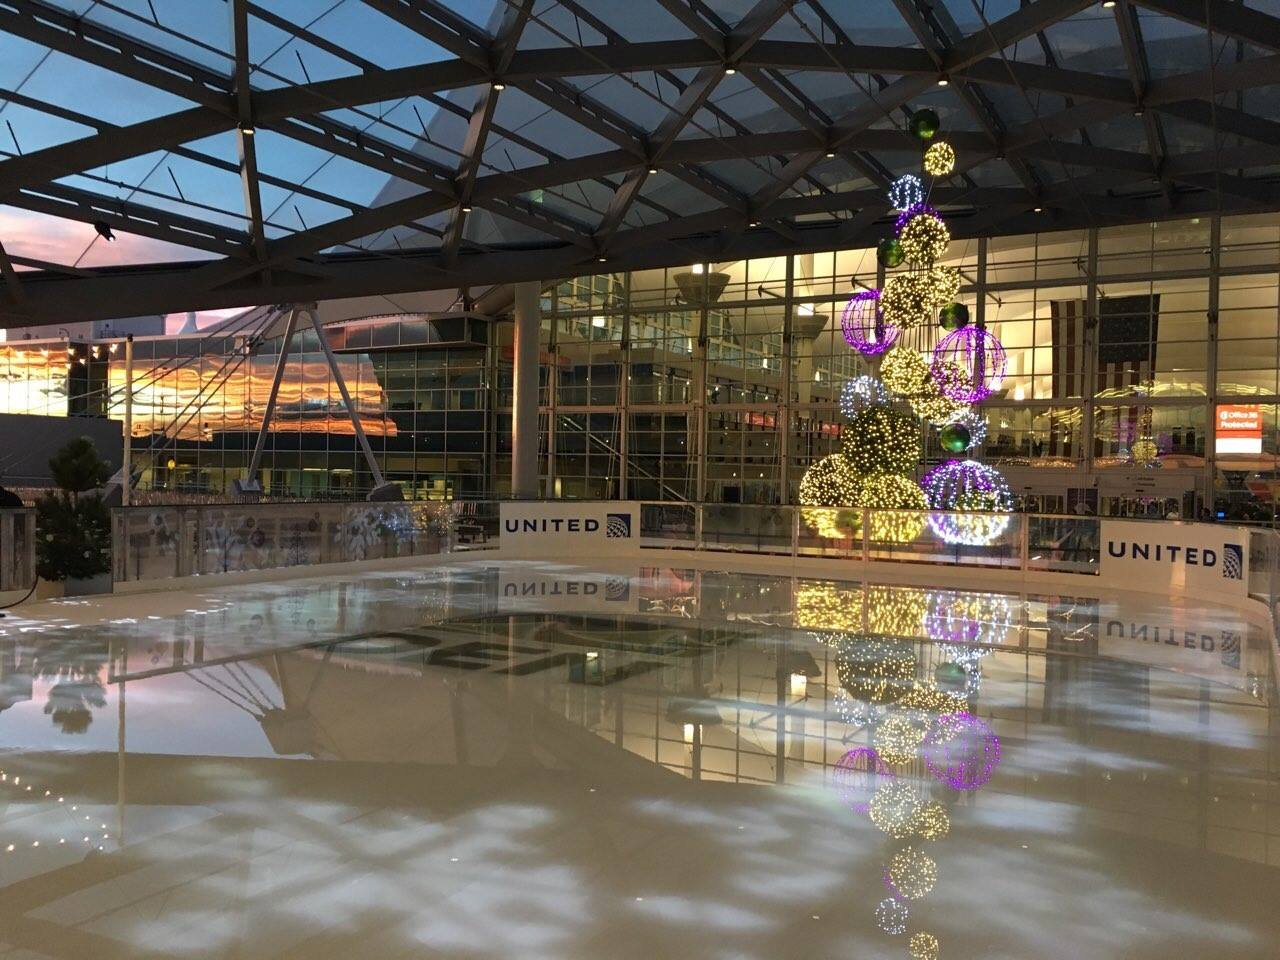 The skating rink at Denver International Airport